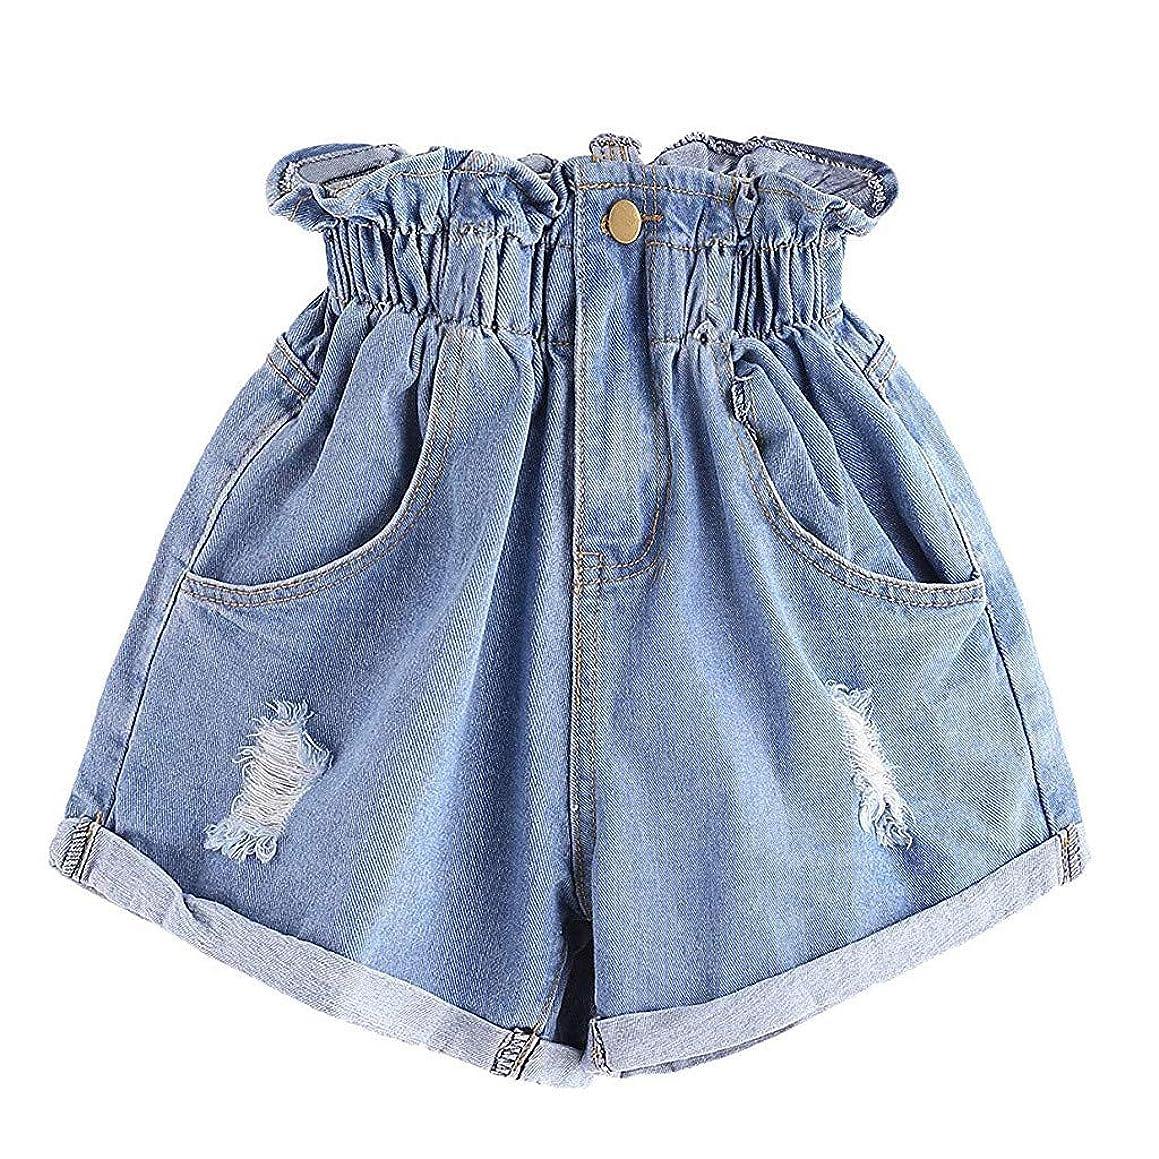 Dumanfs Women's Waist Denim Shorts Flower Trousers Fashion Casual Short Jeans